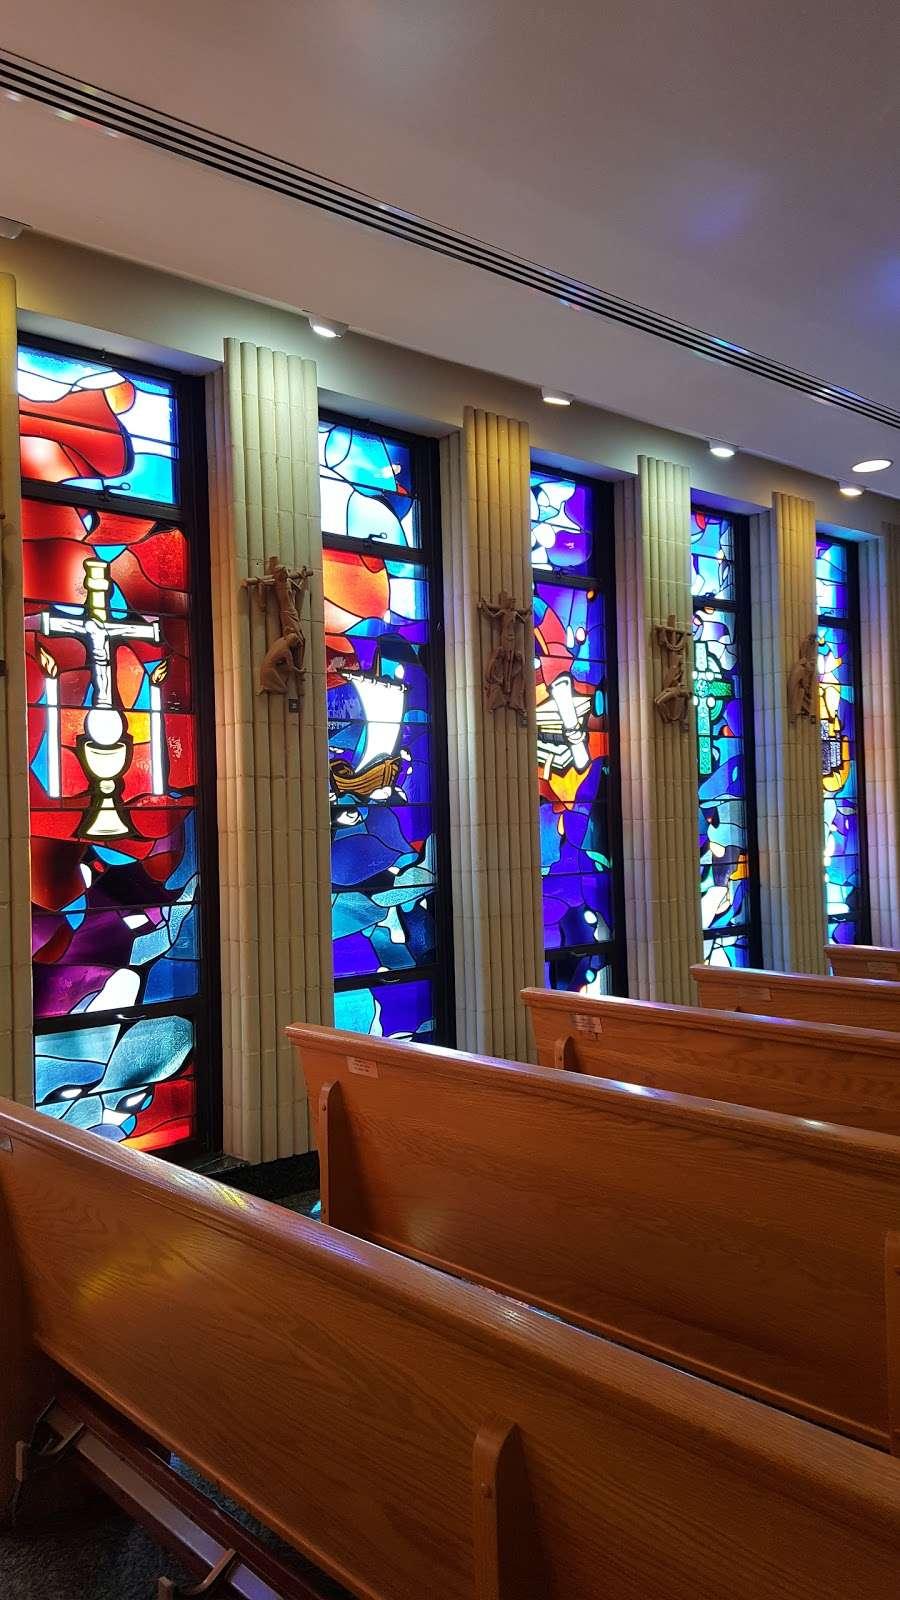 St Columba Church - church    Photo 6 of 10   Address: 2245 Kimball St, Brooklyn, NY 11234, USA   Phone: (718) 338-6265